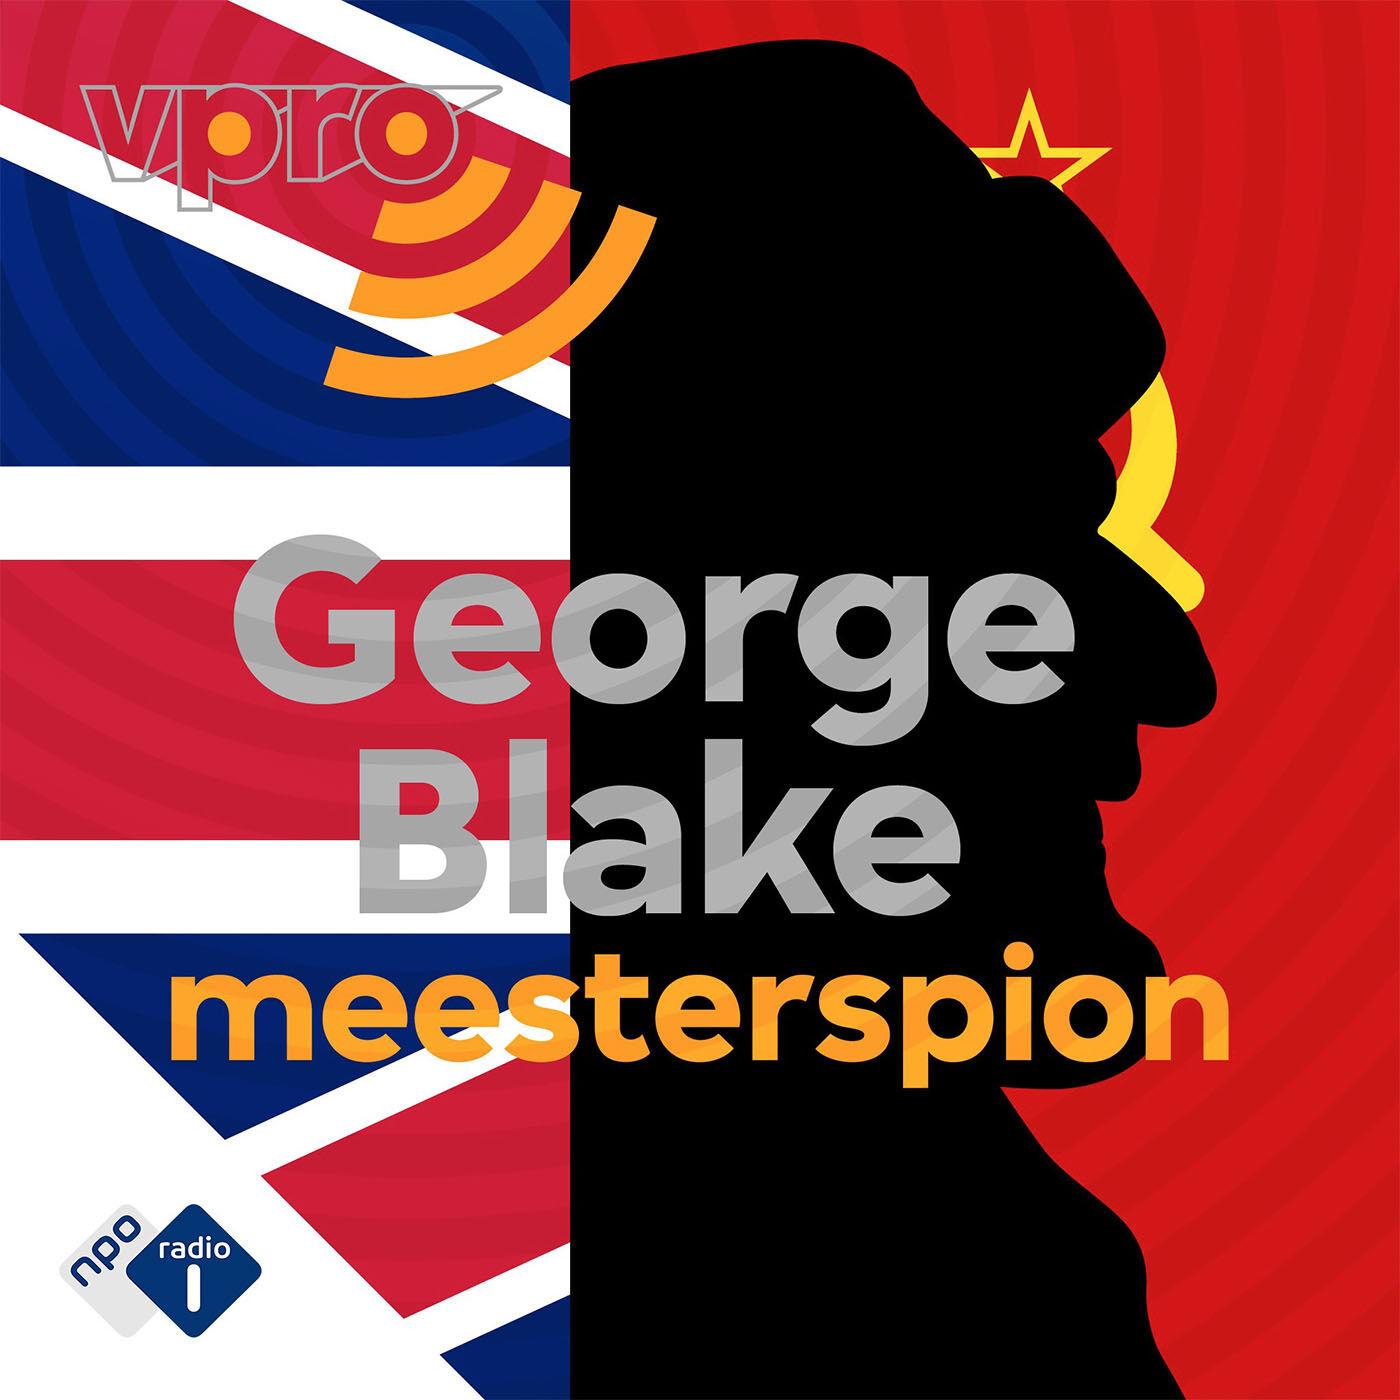 George Blake: meesterspion podcast show image